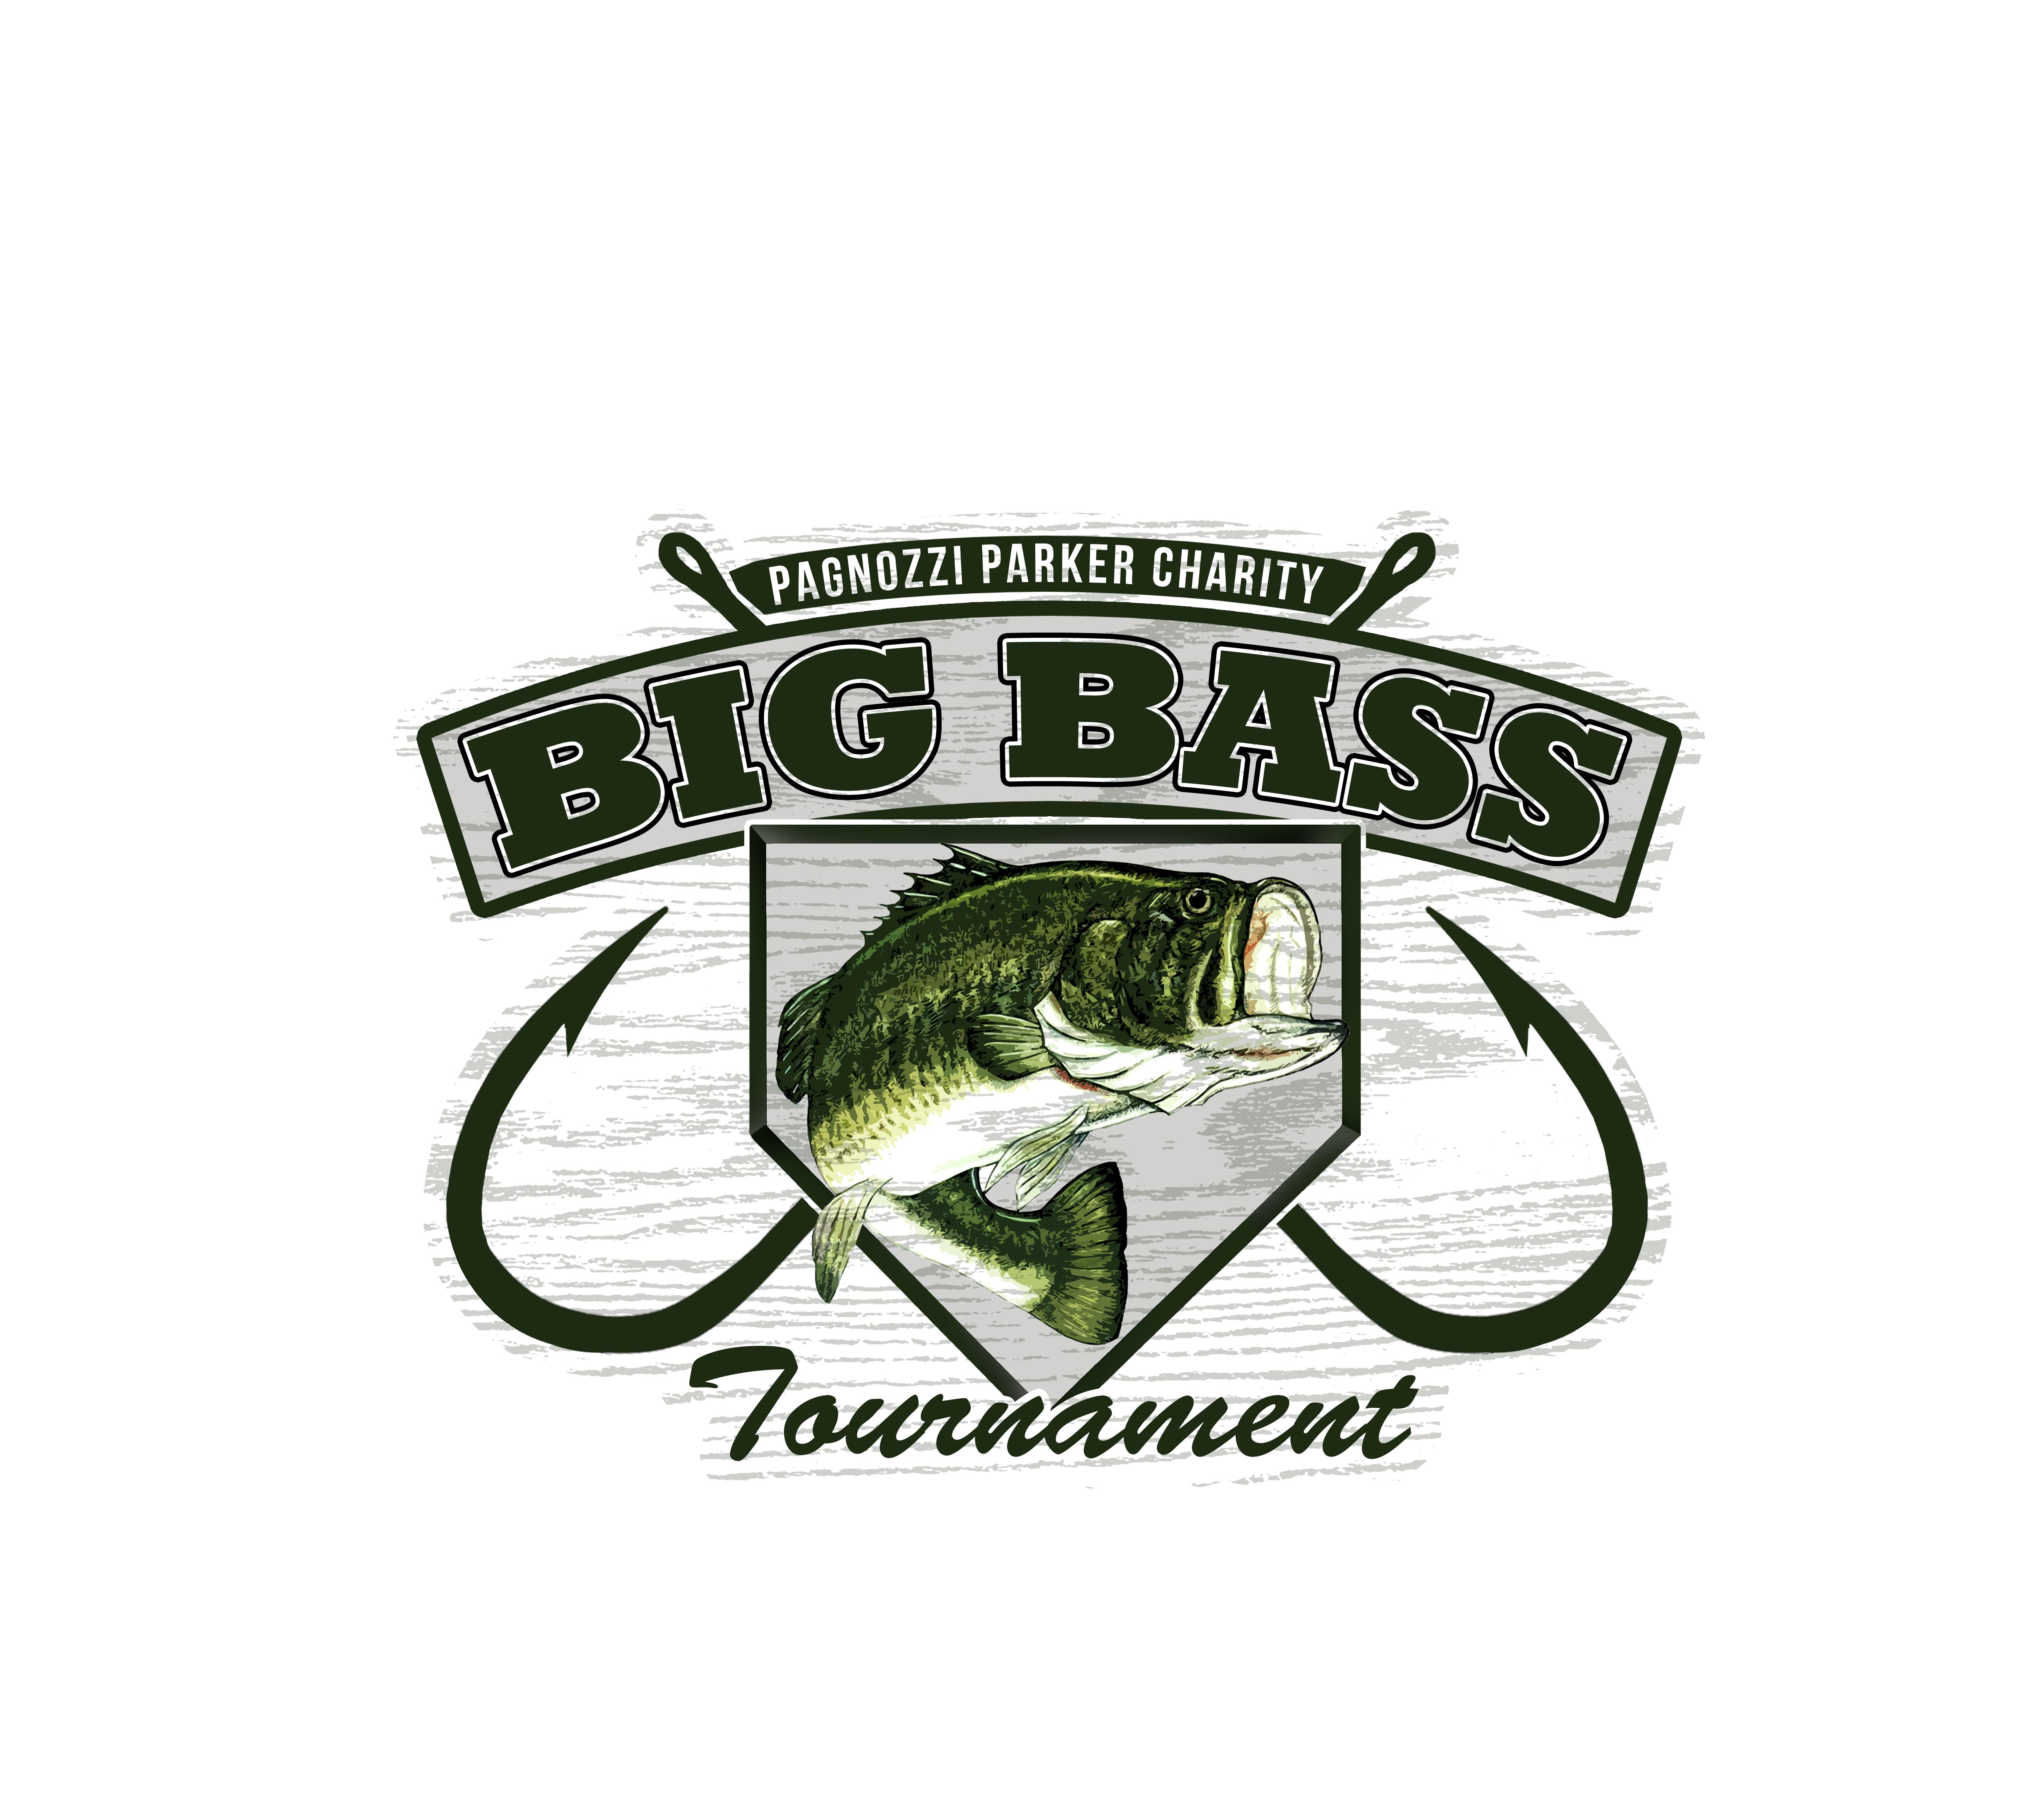 9th Annual Pagnozzi Parker Charity Big Bass Tournament